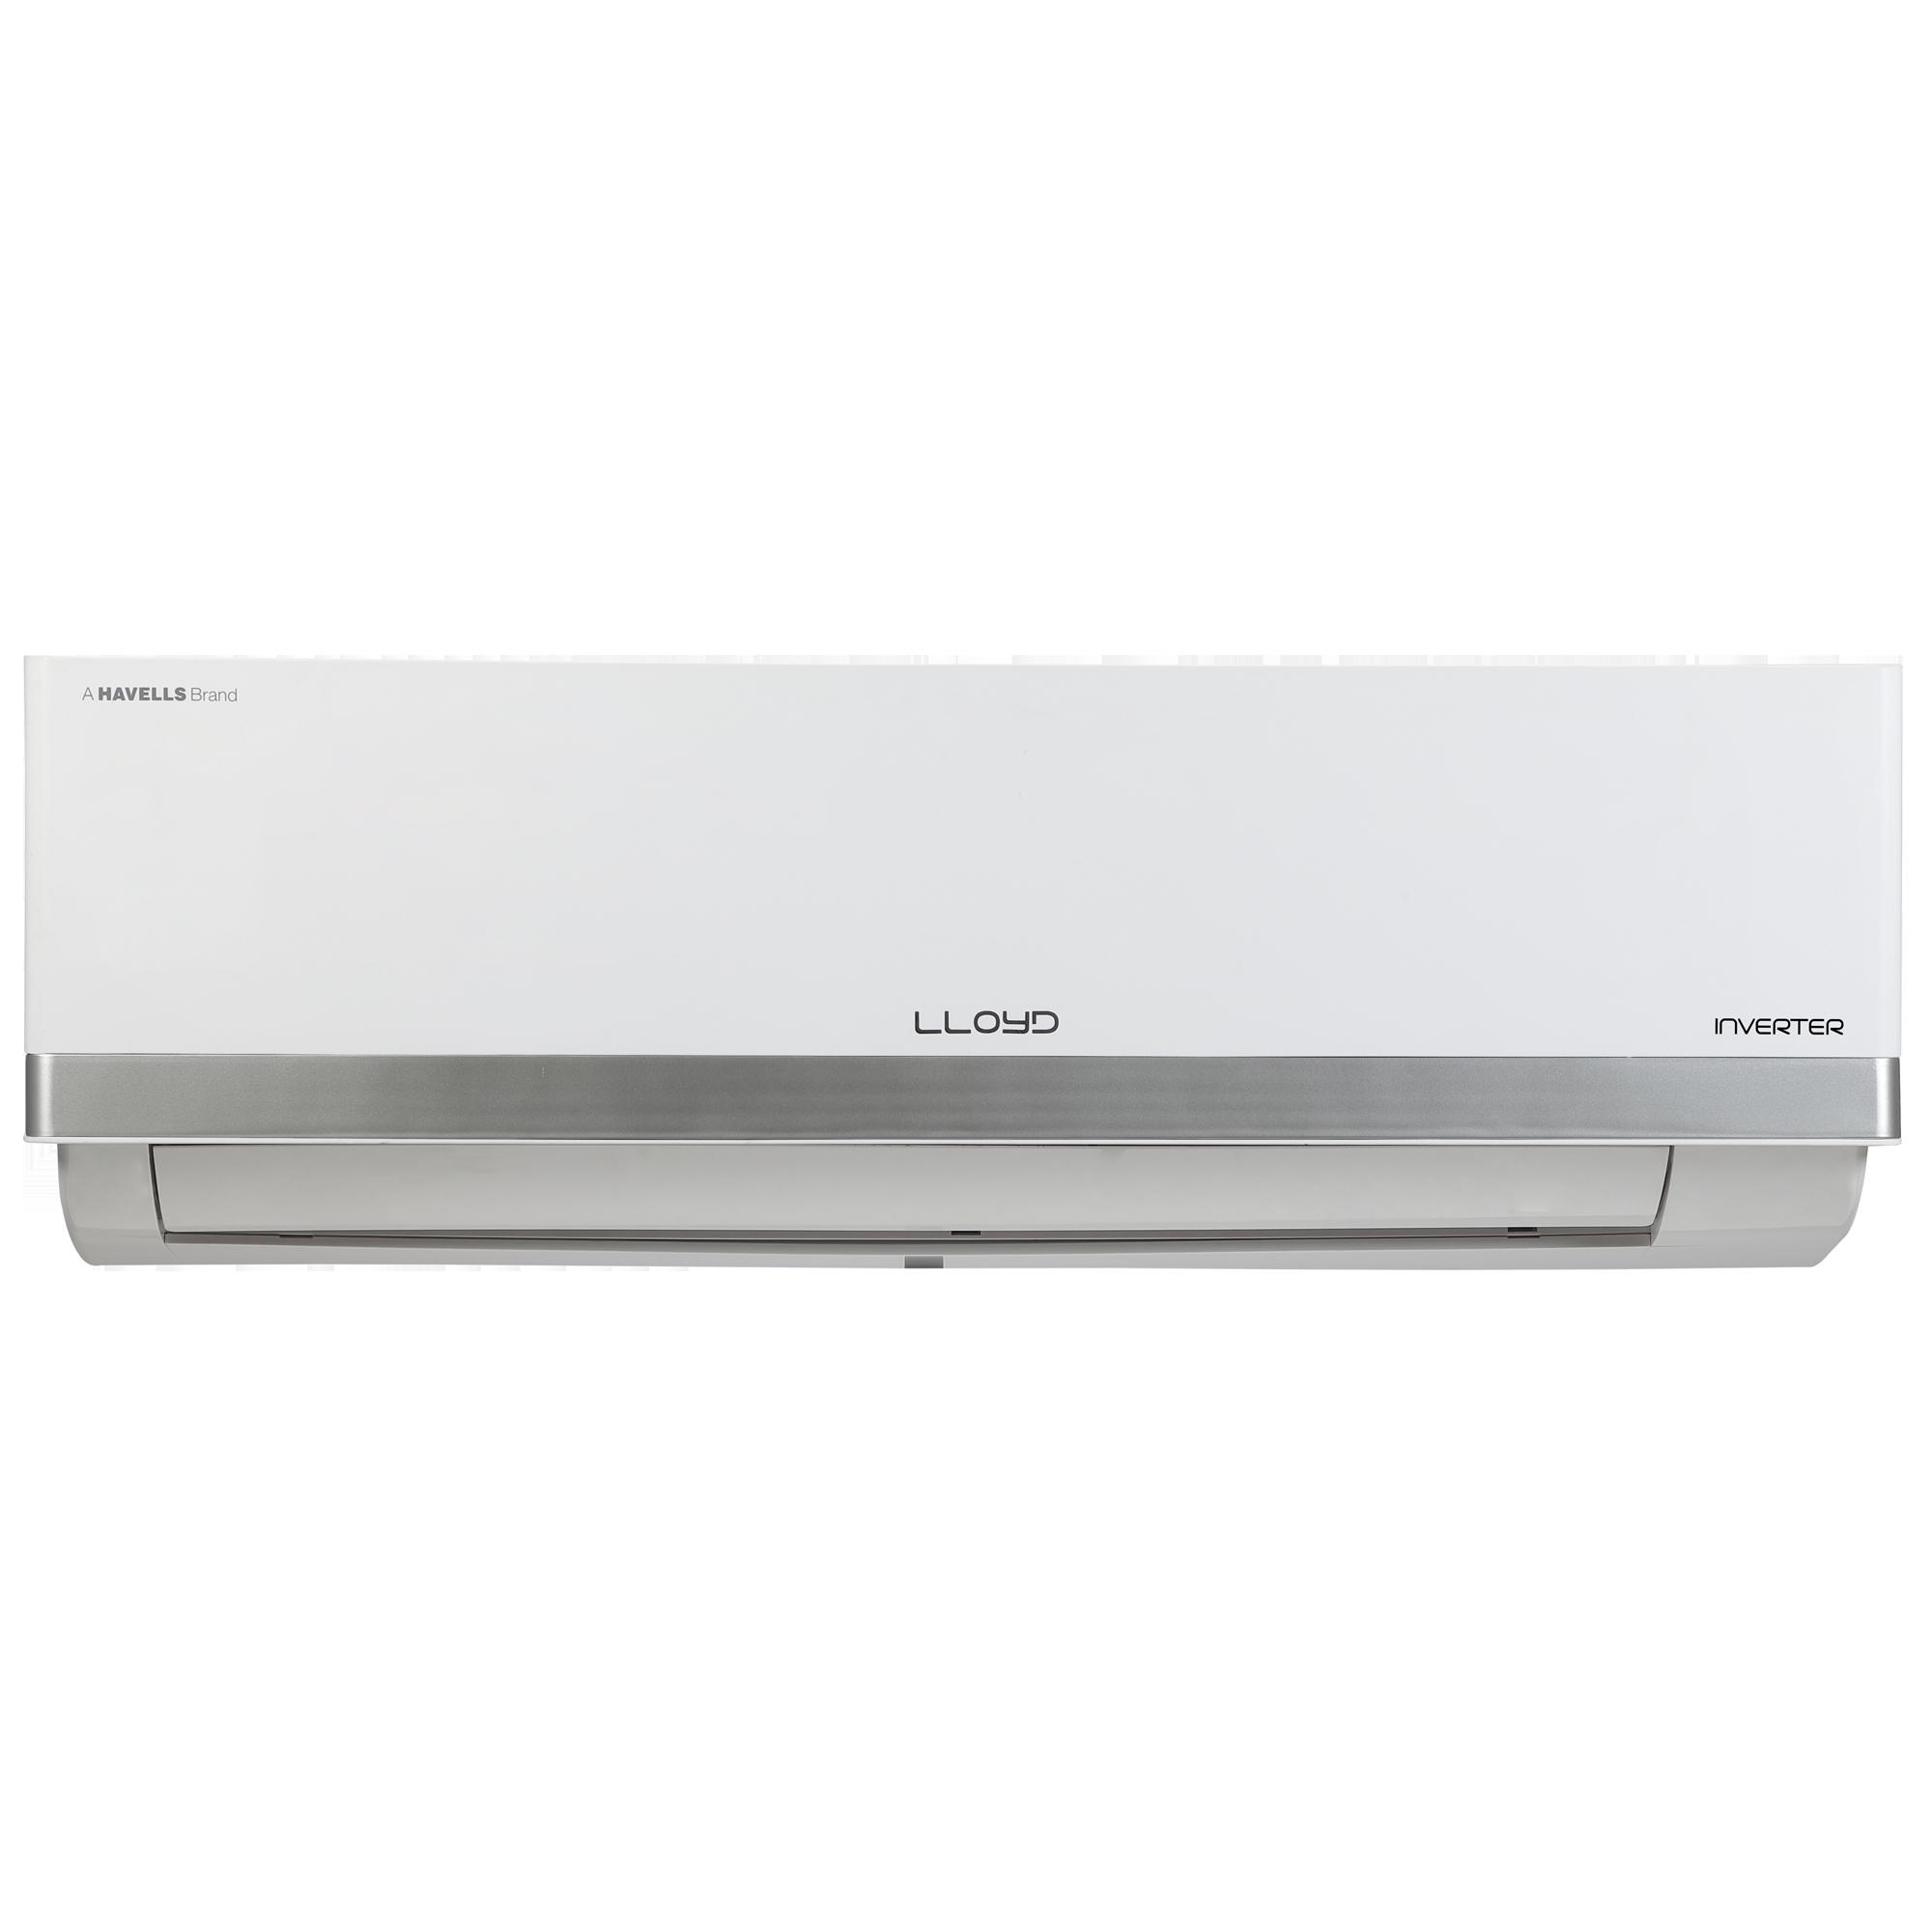 Lloyd BP 1 Ton 3 Star Inverter Split AC (Copper Condenser, GLS12I36WSBP, White)_1